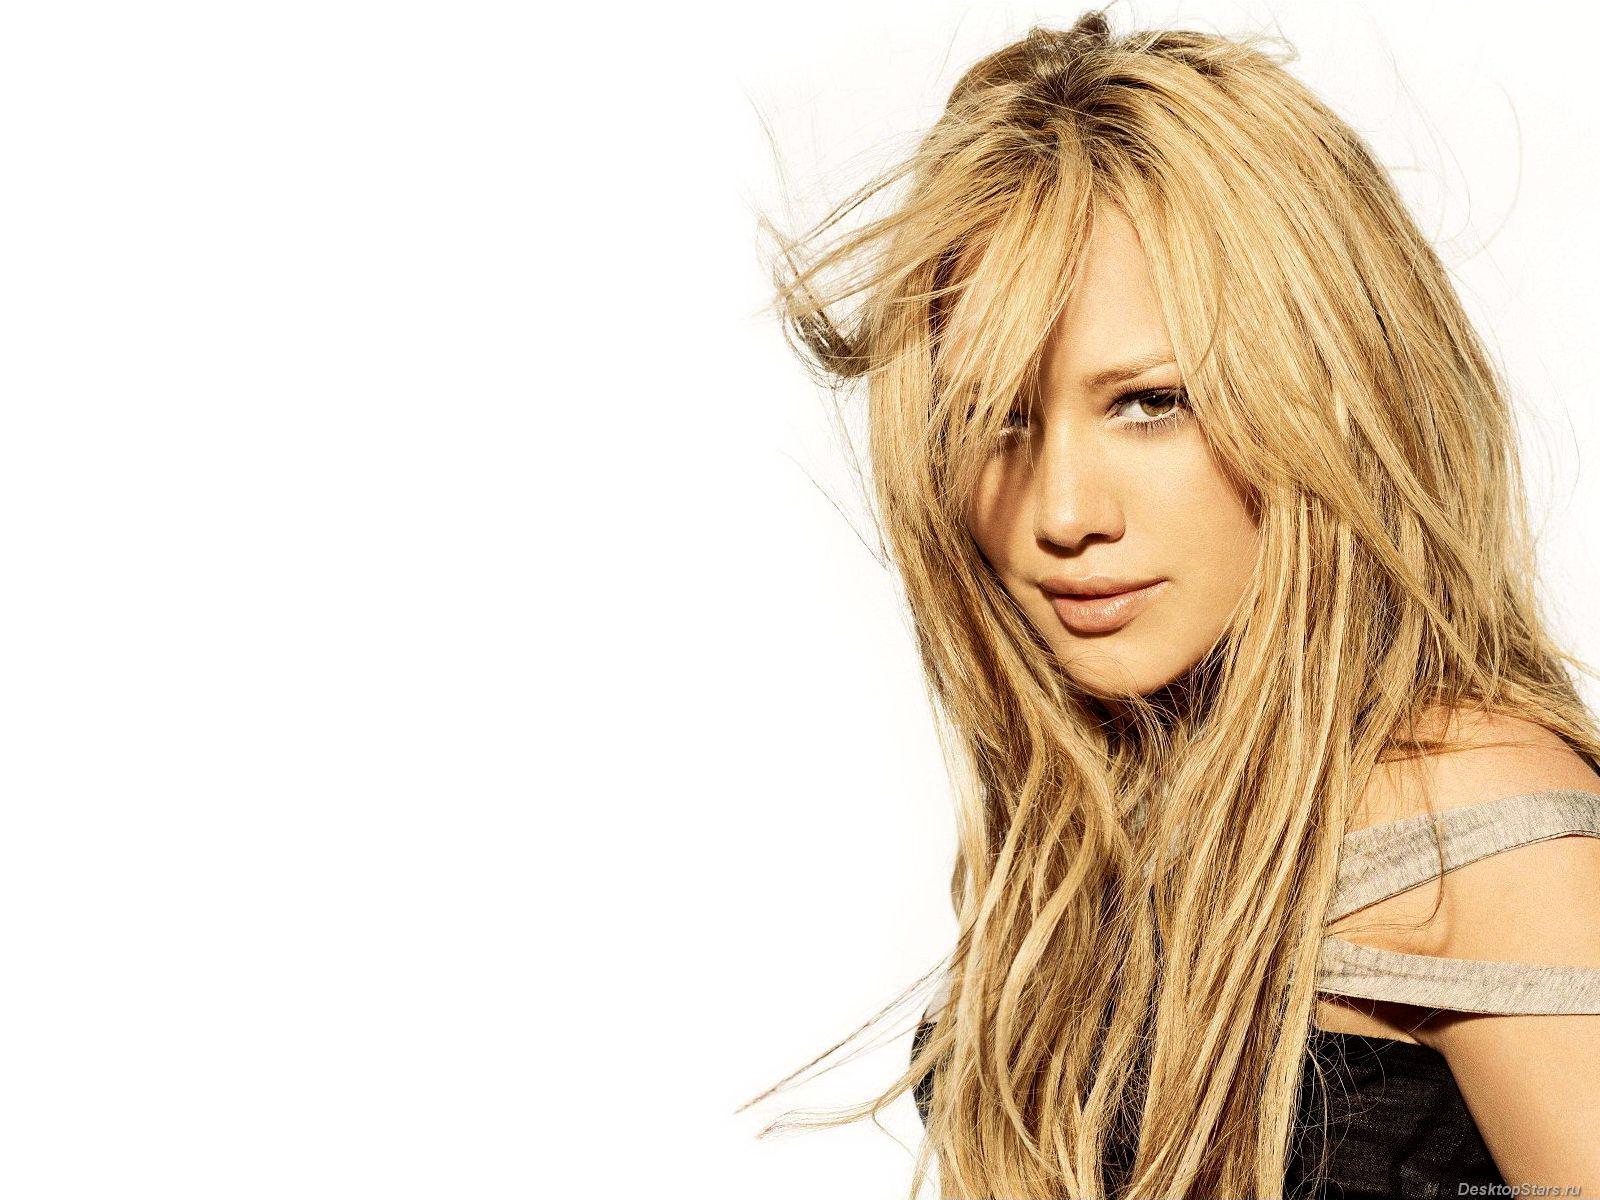 Hilary Duff During Photoshoot